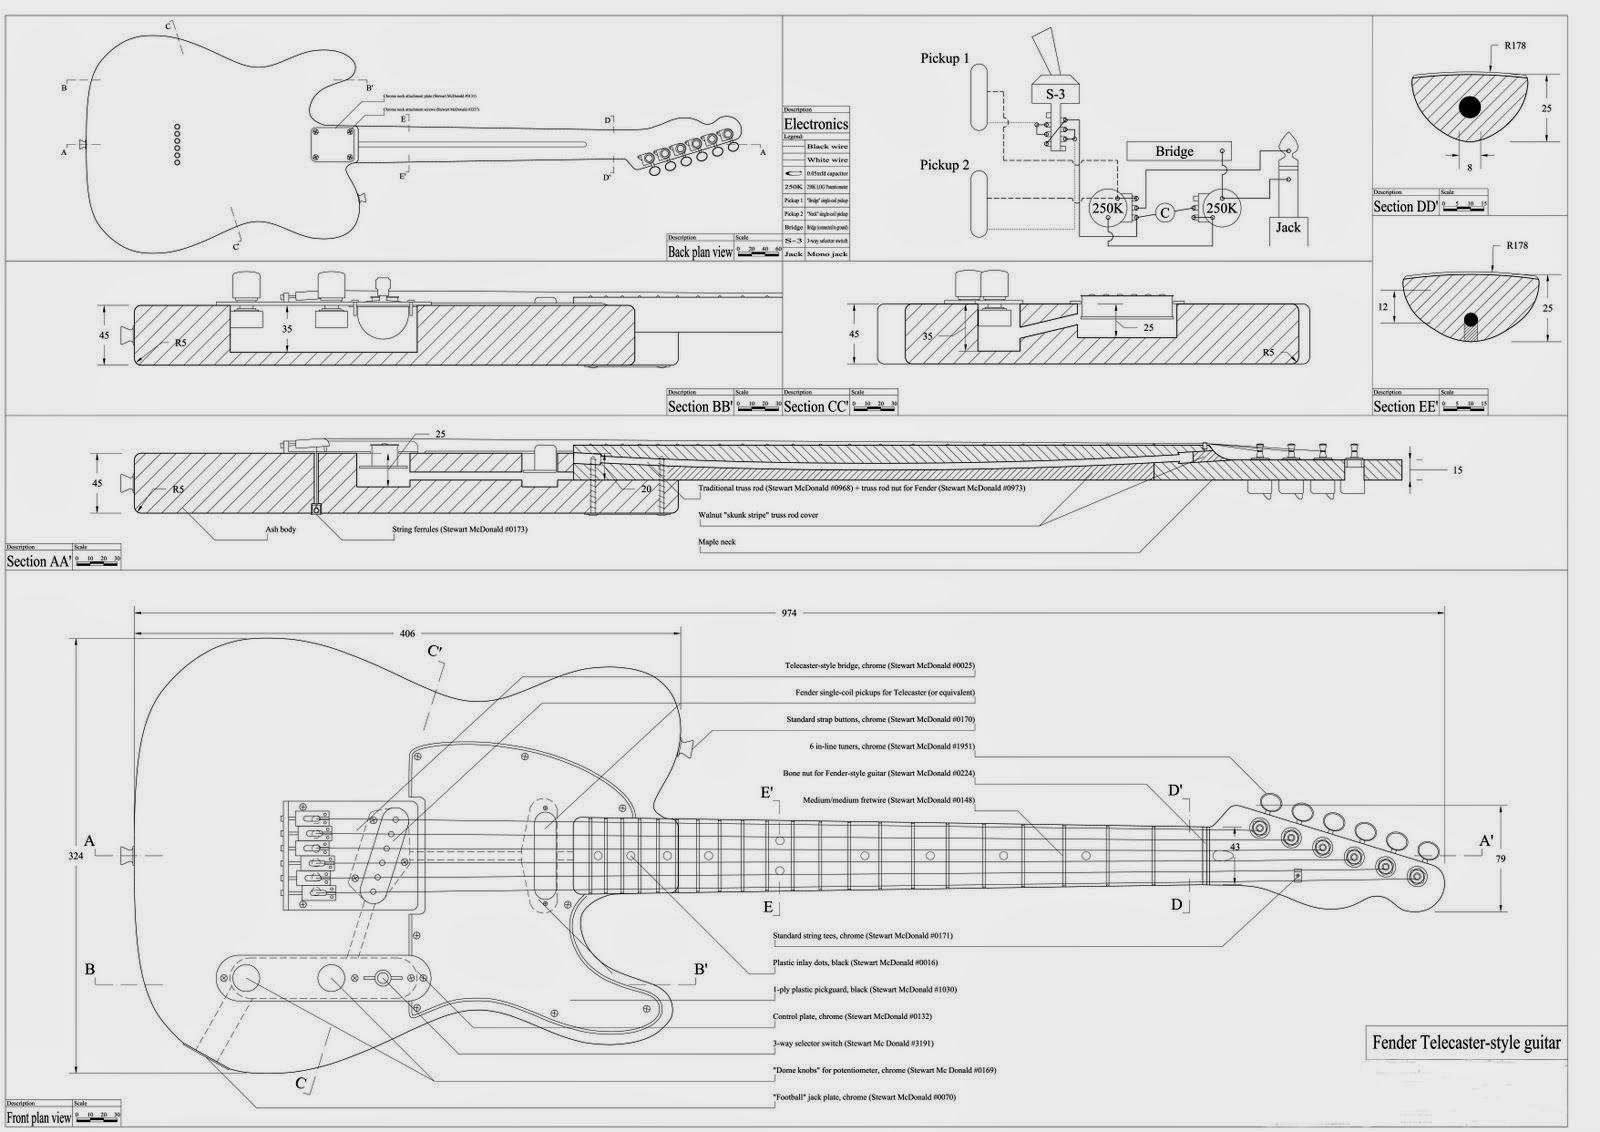 Printable guitar template PDF? - Page 26 - Telecaster Guitar Forum ...